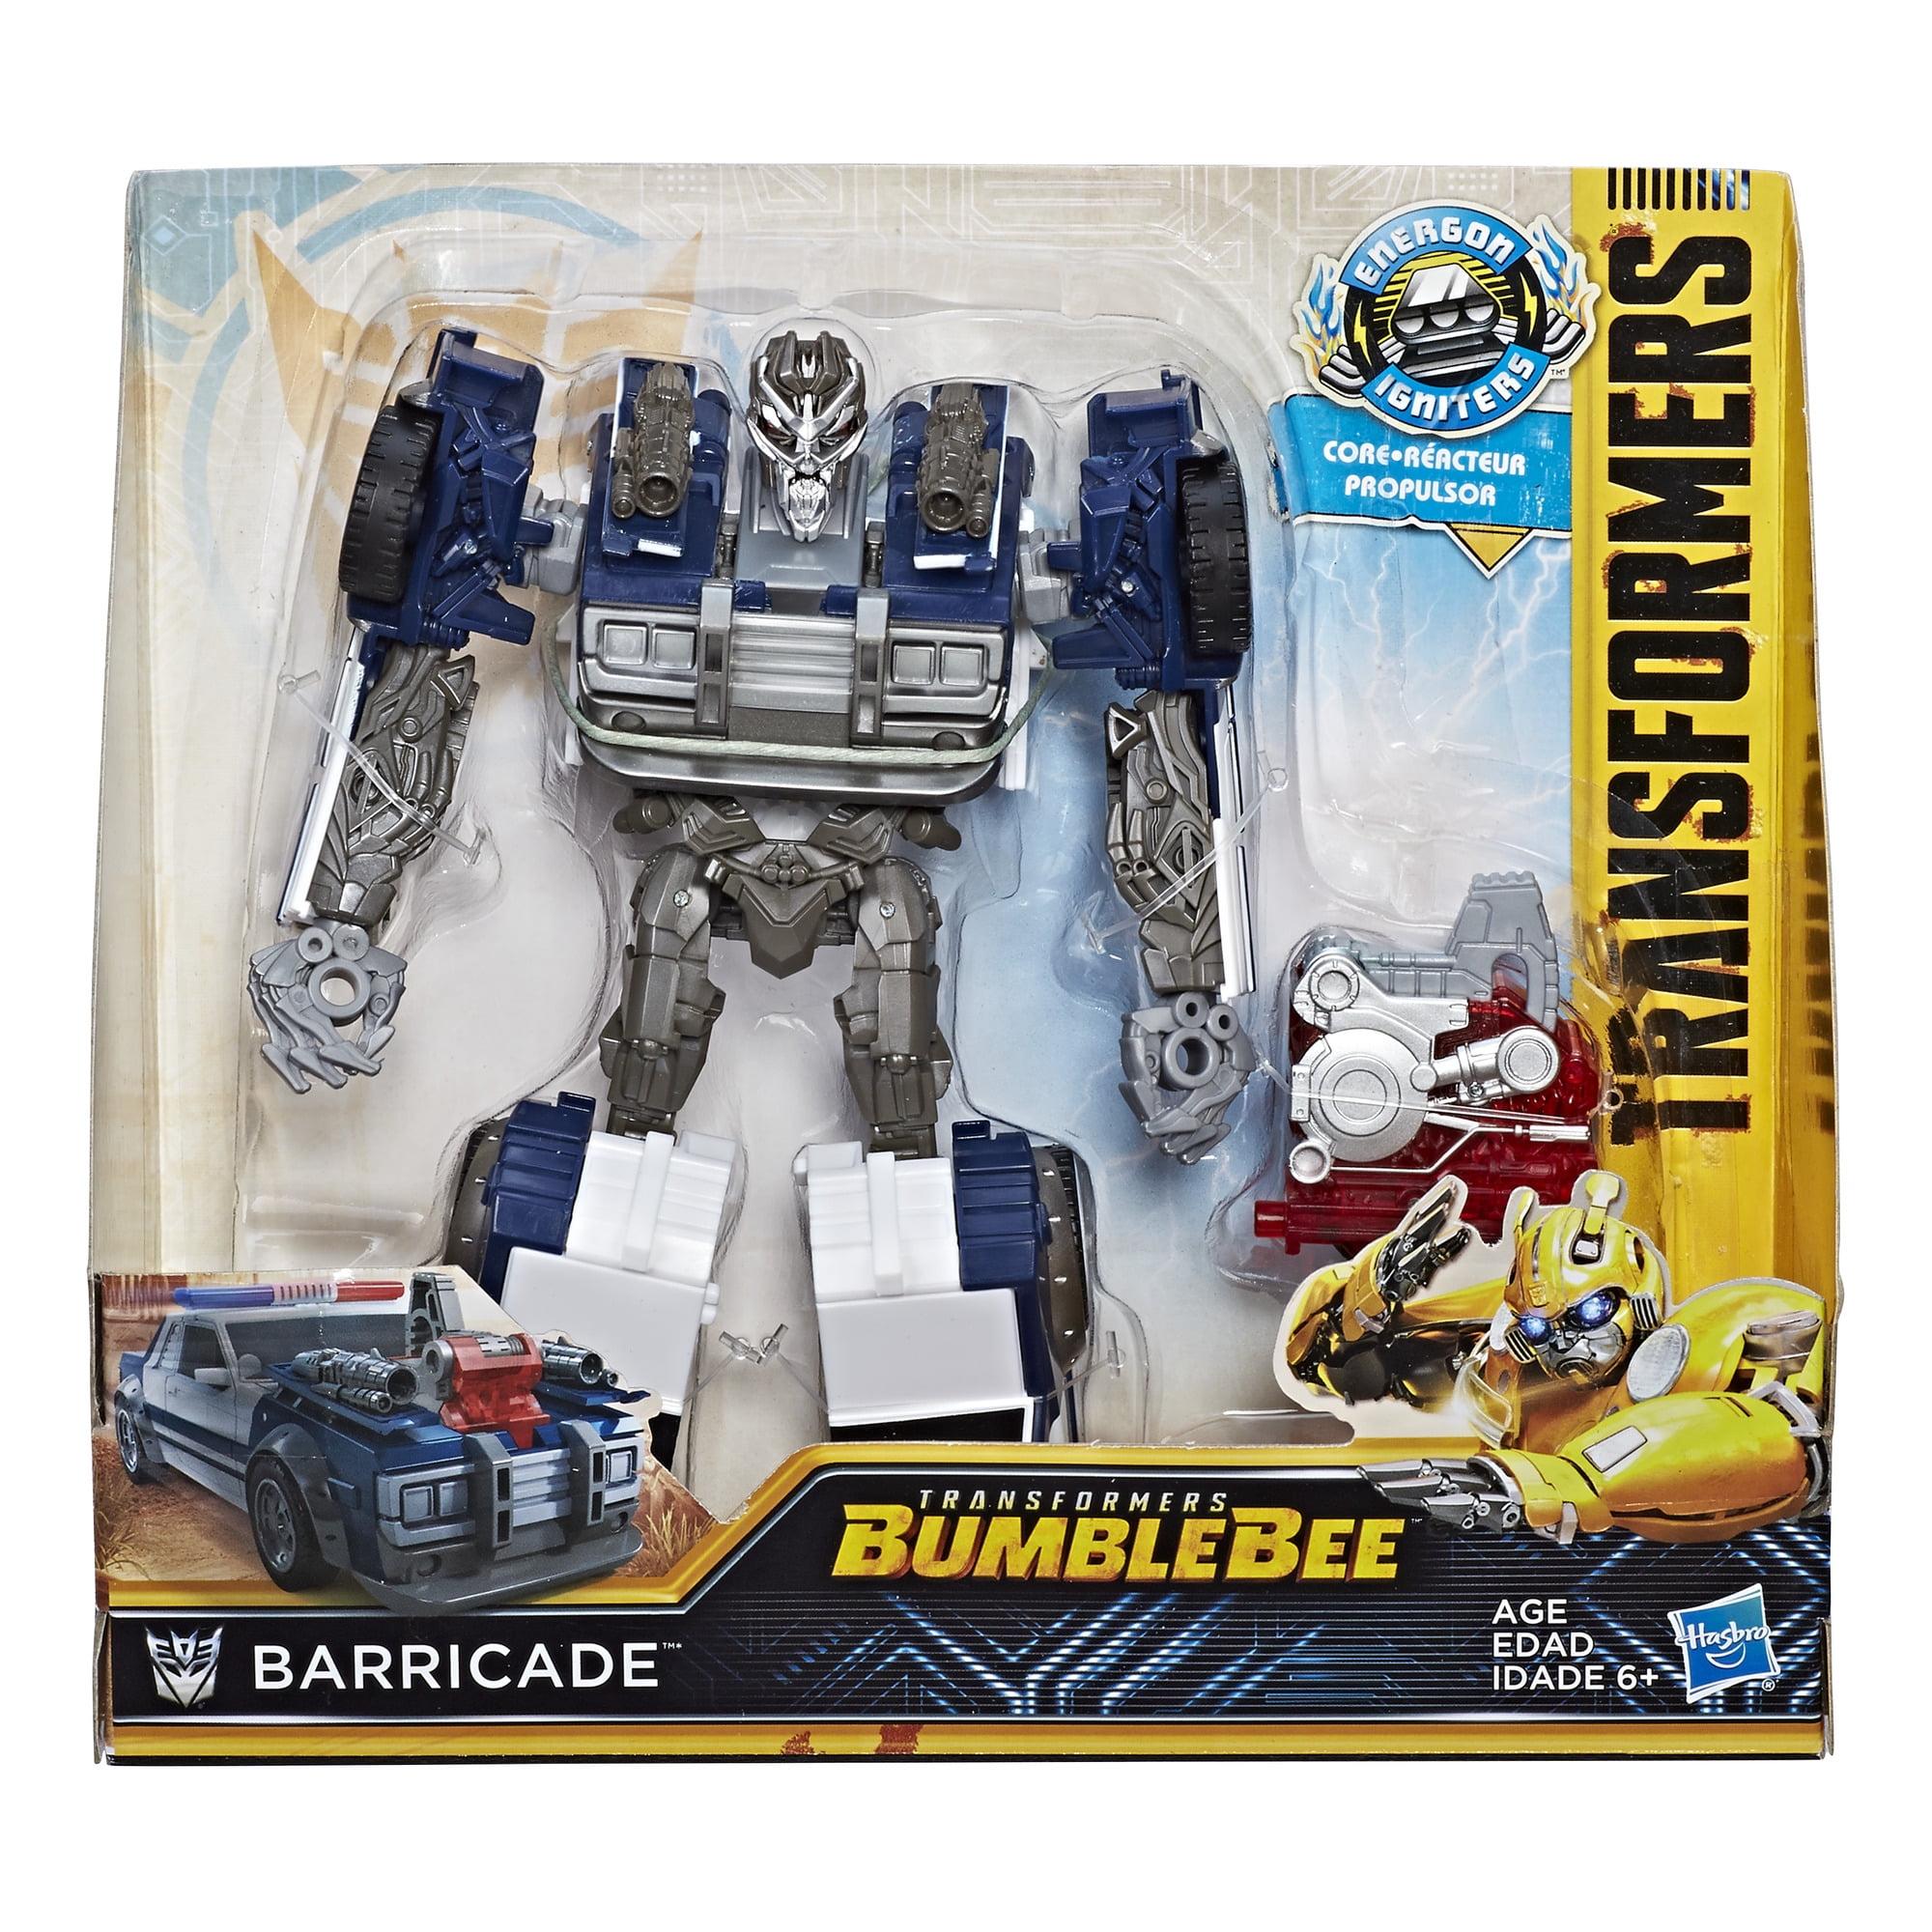 Transformers mv6 energon igniters nitro barricade